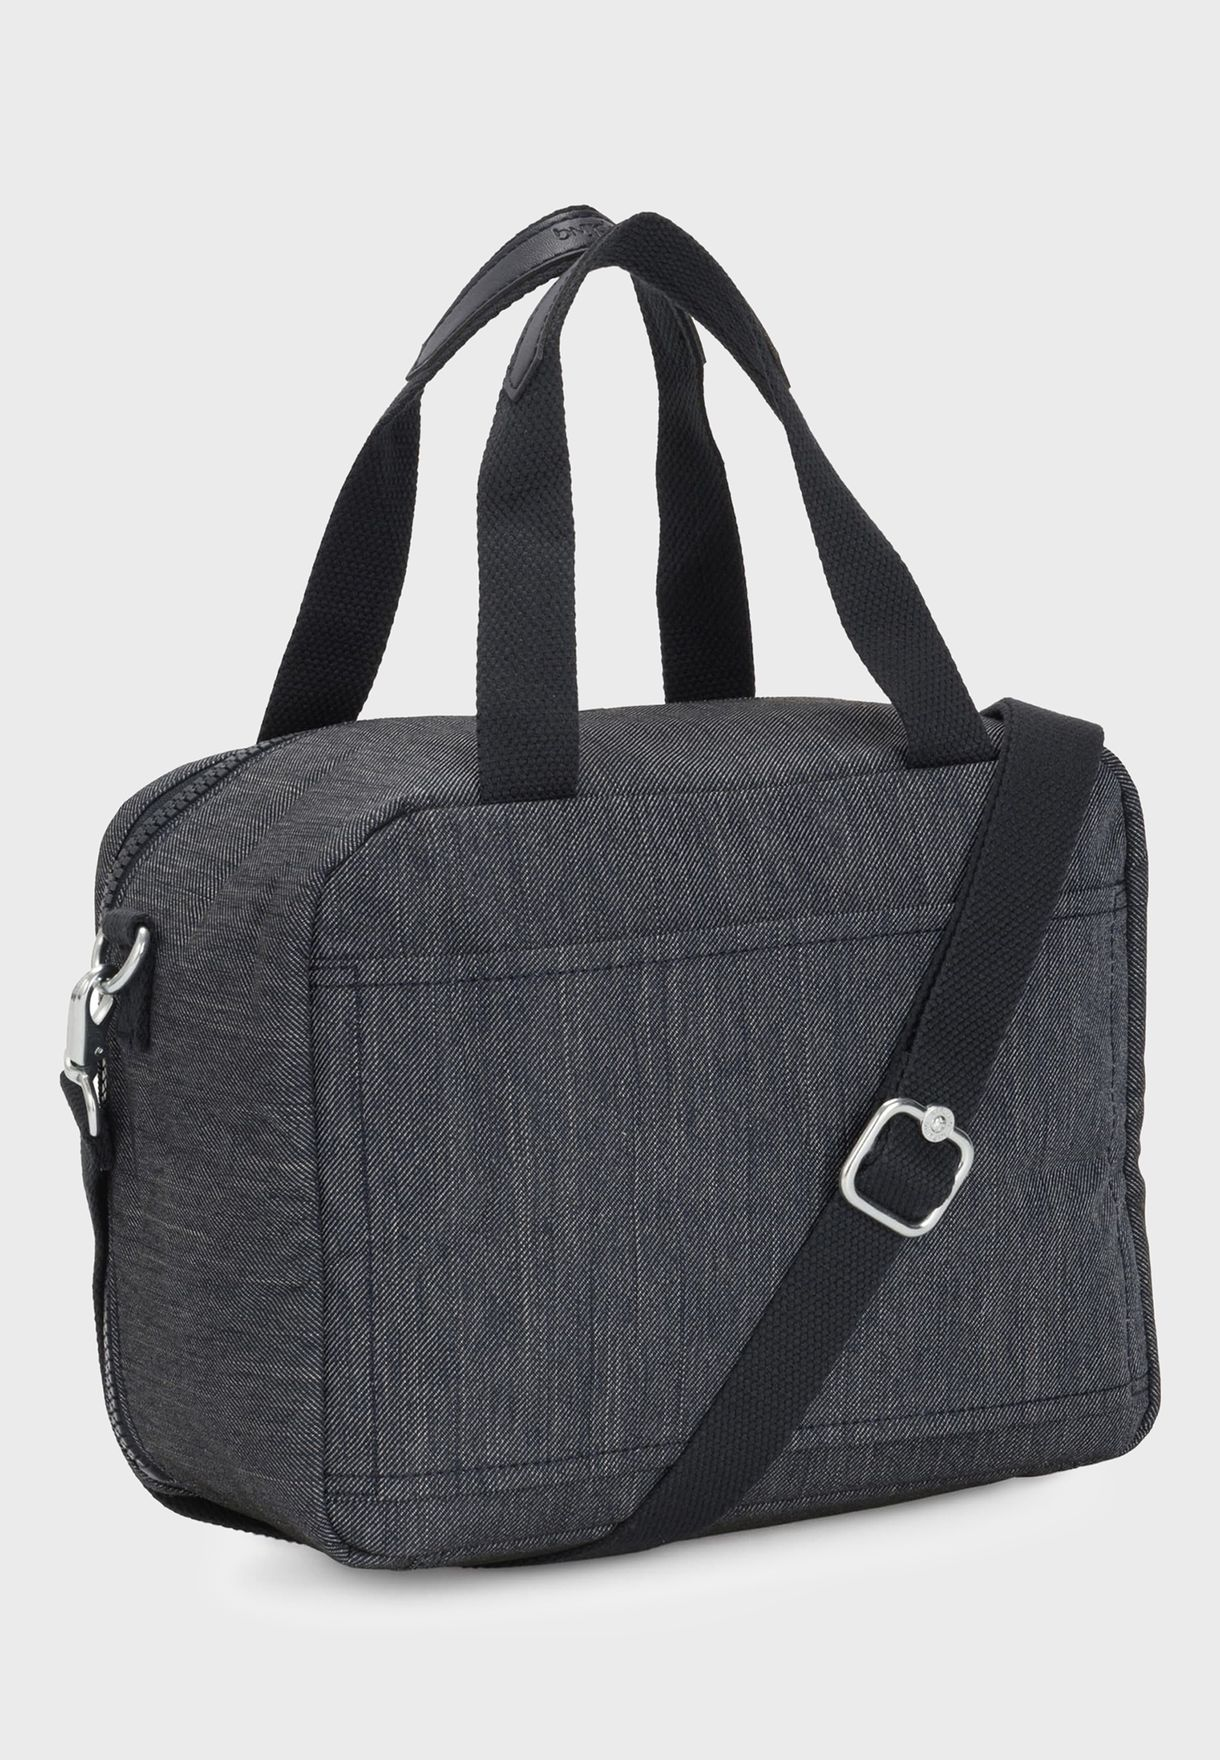 Miyo Lunch Bag